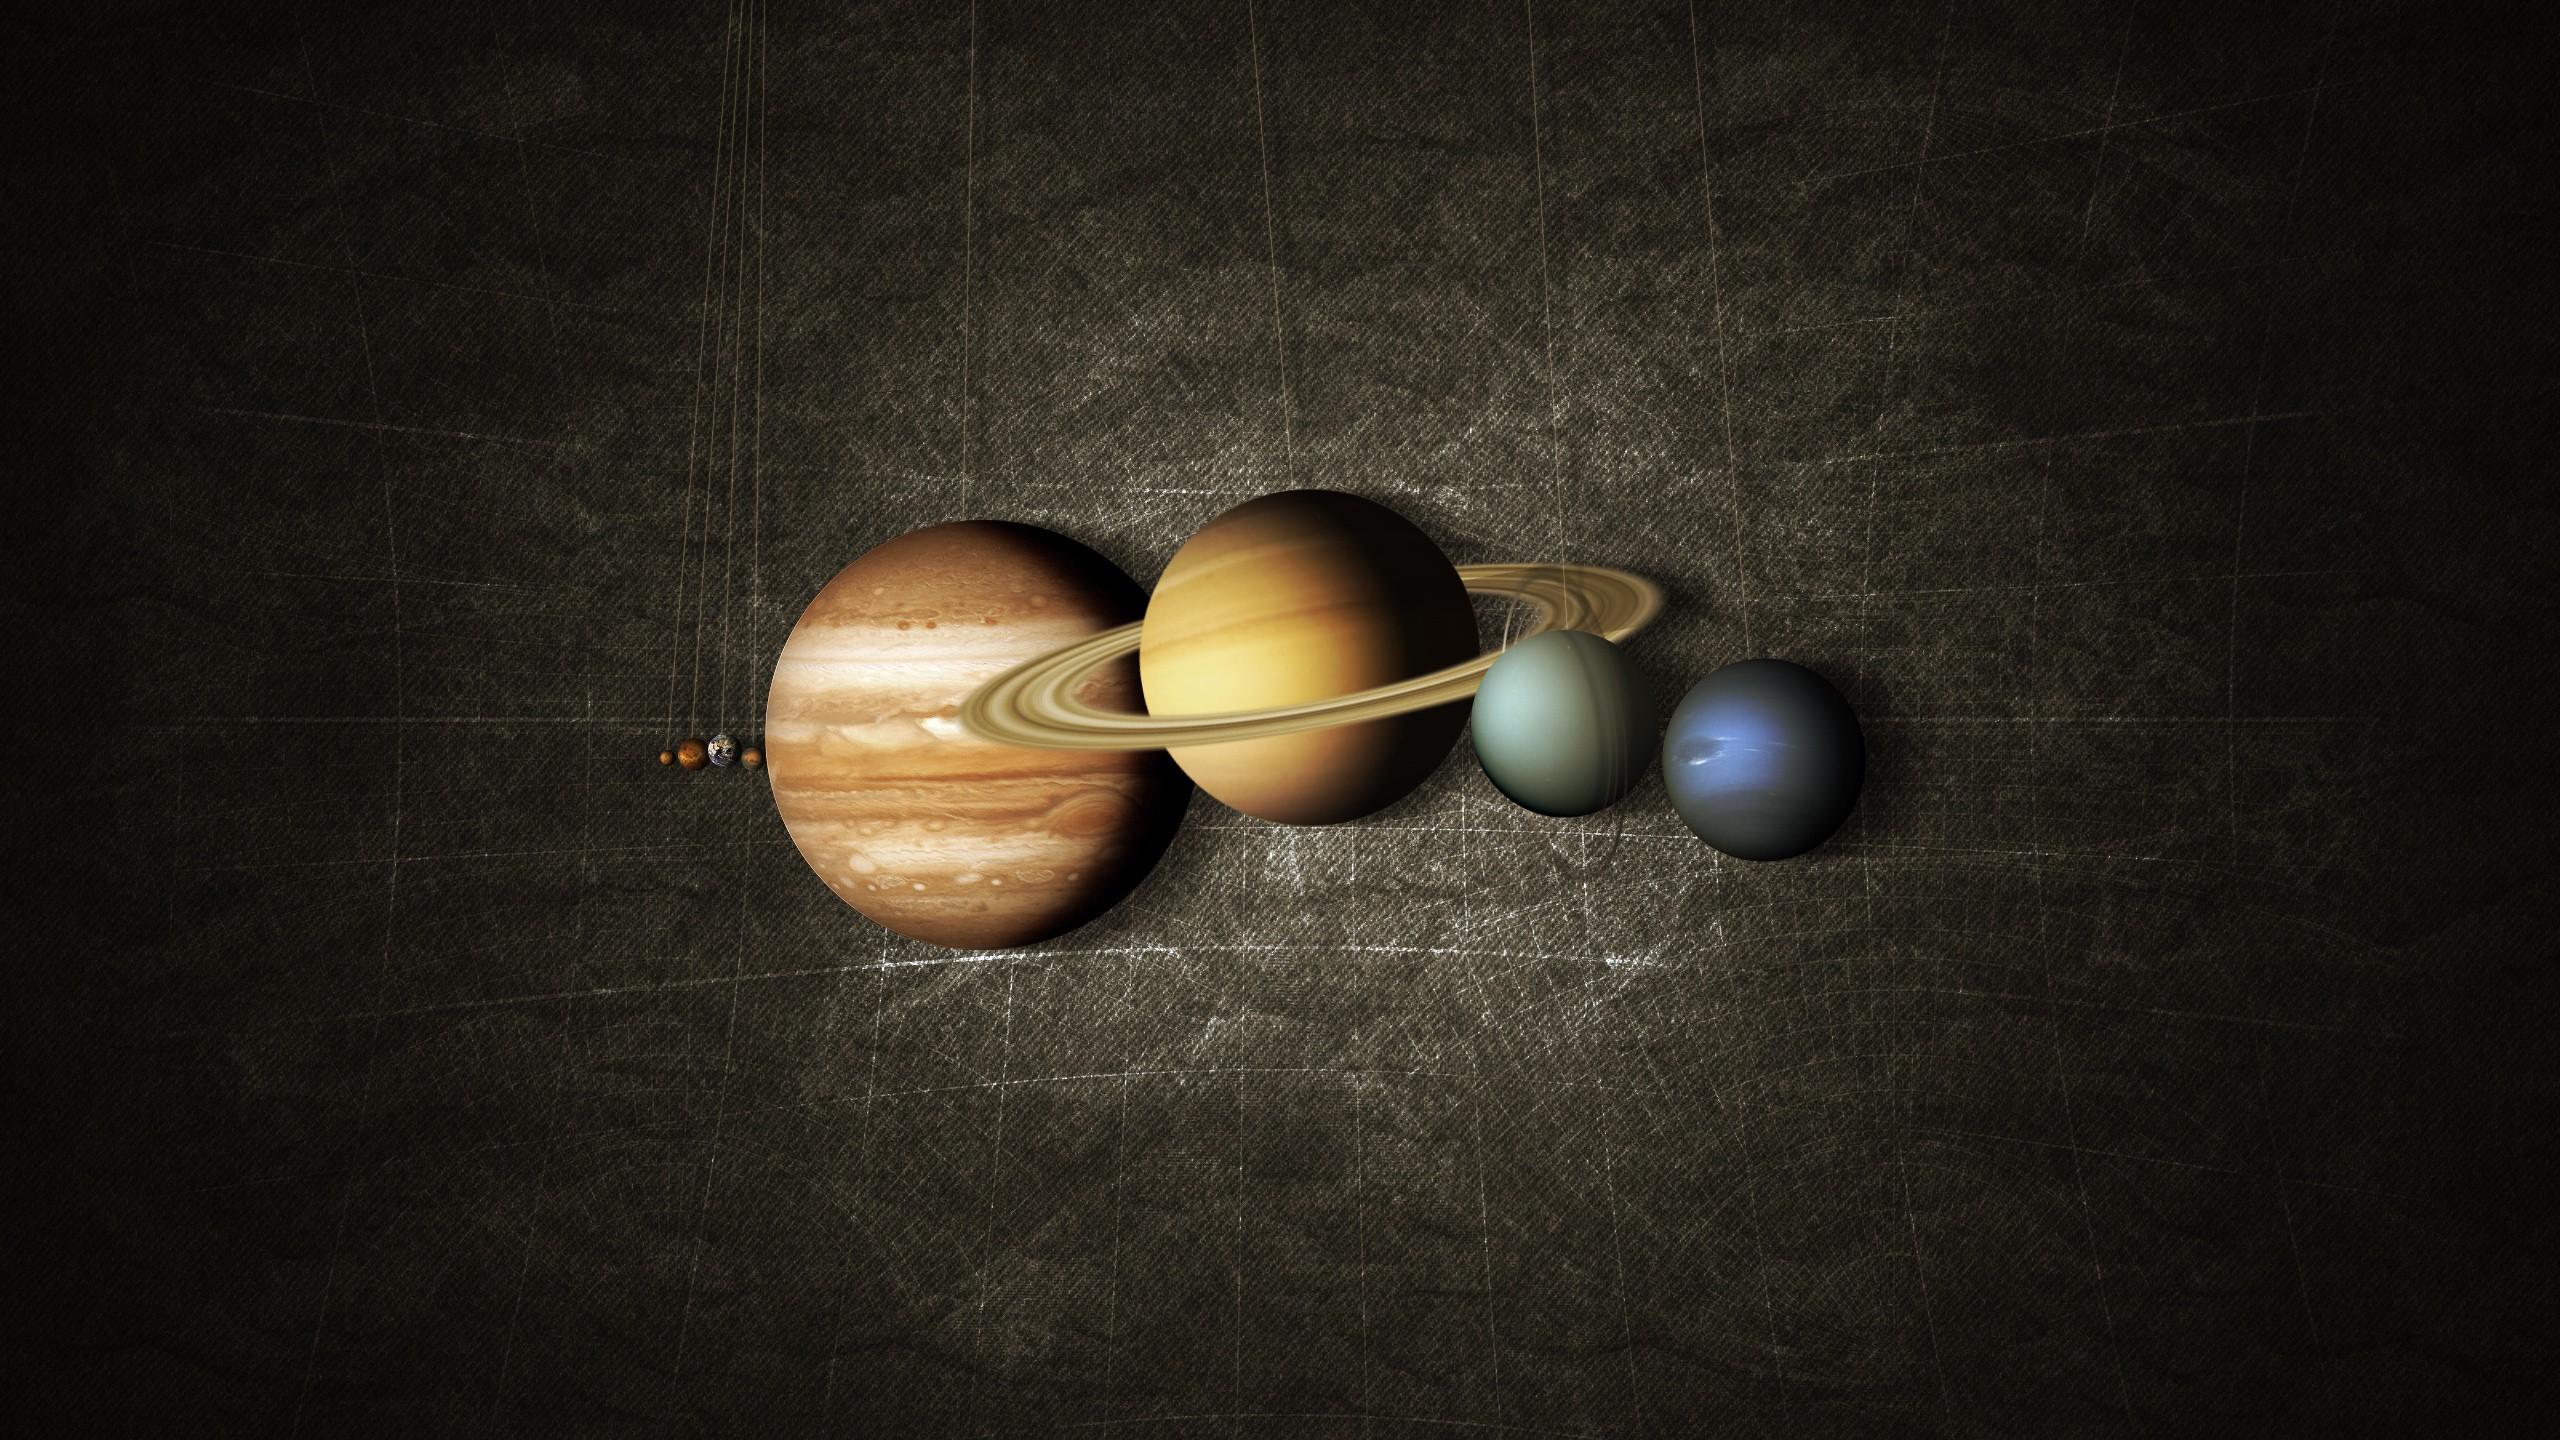 Wallpaper : black, digital art, planet, space, sphere, Earth